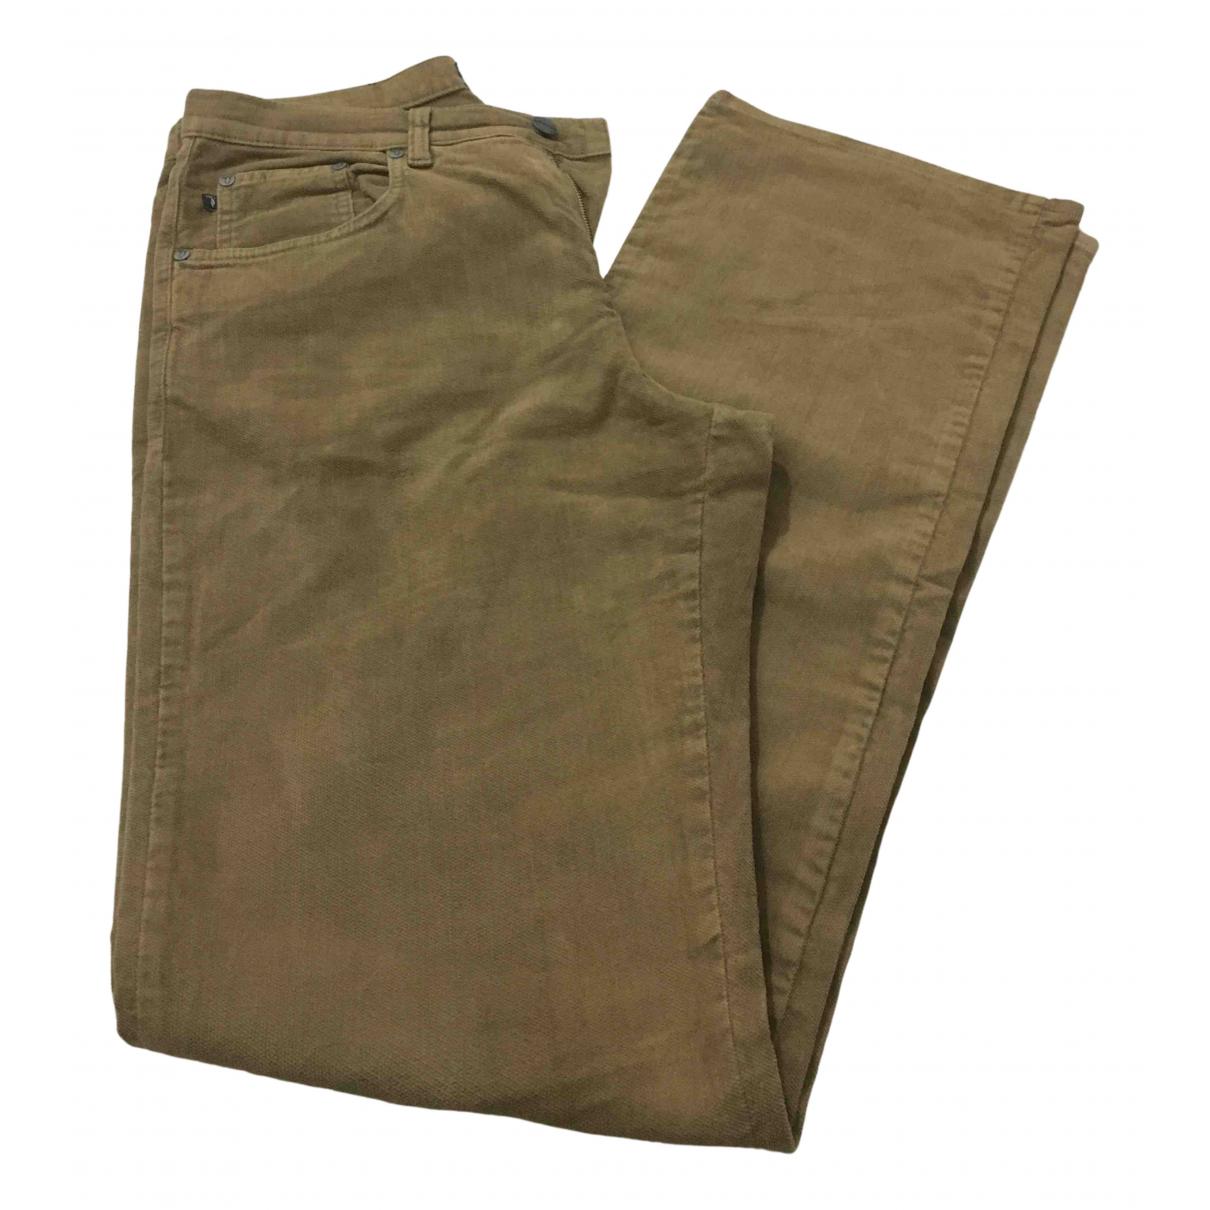 Trussardi Jeans N Camel Cotton Trousers for Men 32 UK - US